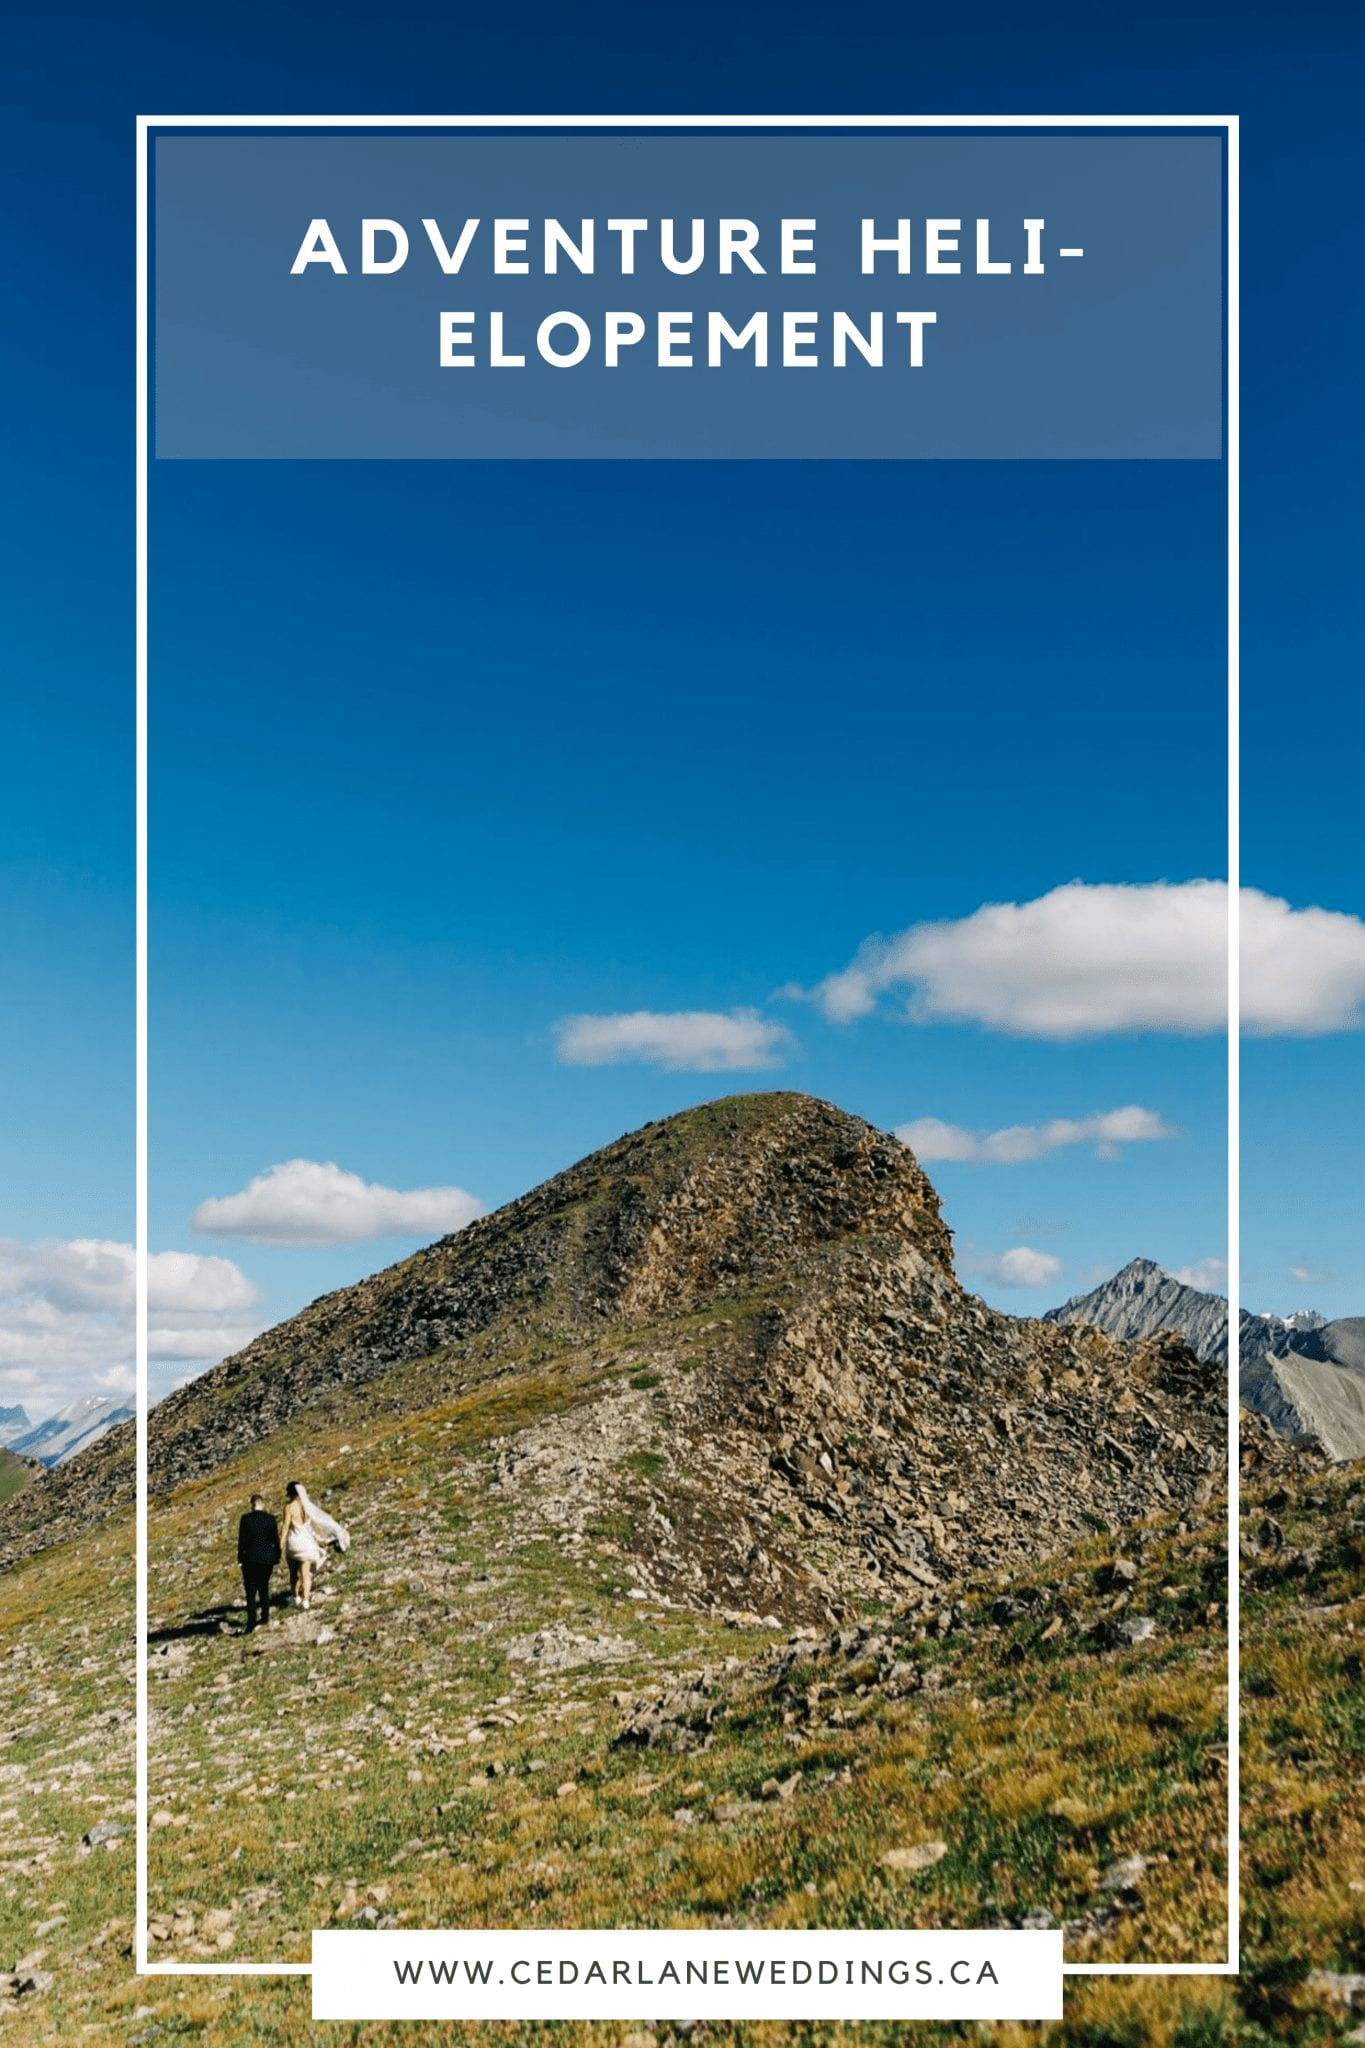 Banff Heli-Elopement | Adventure Elopement Photographer Nordegg